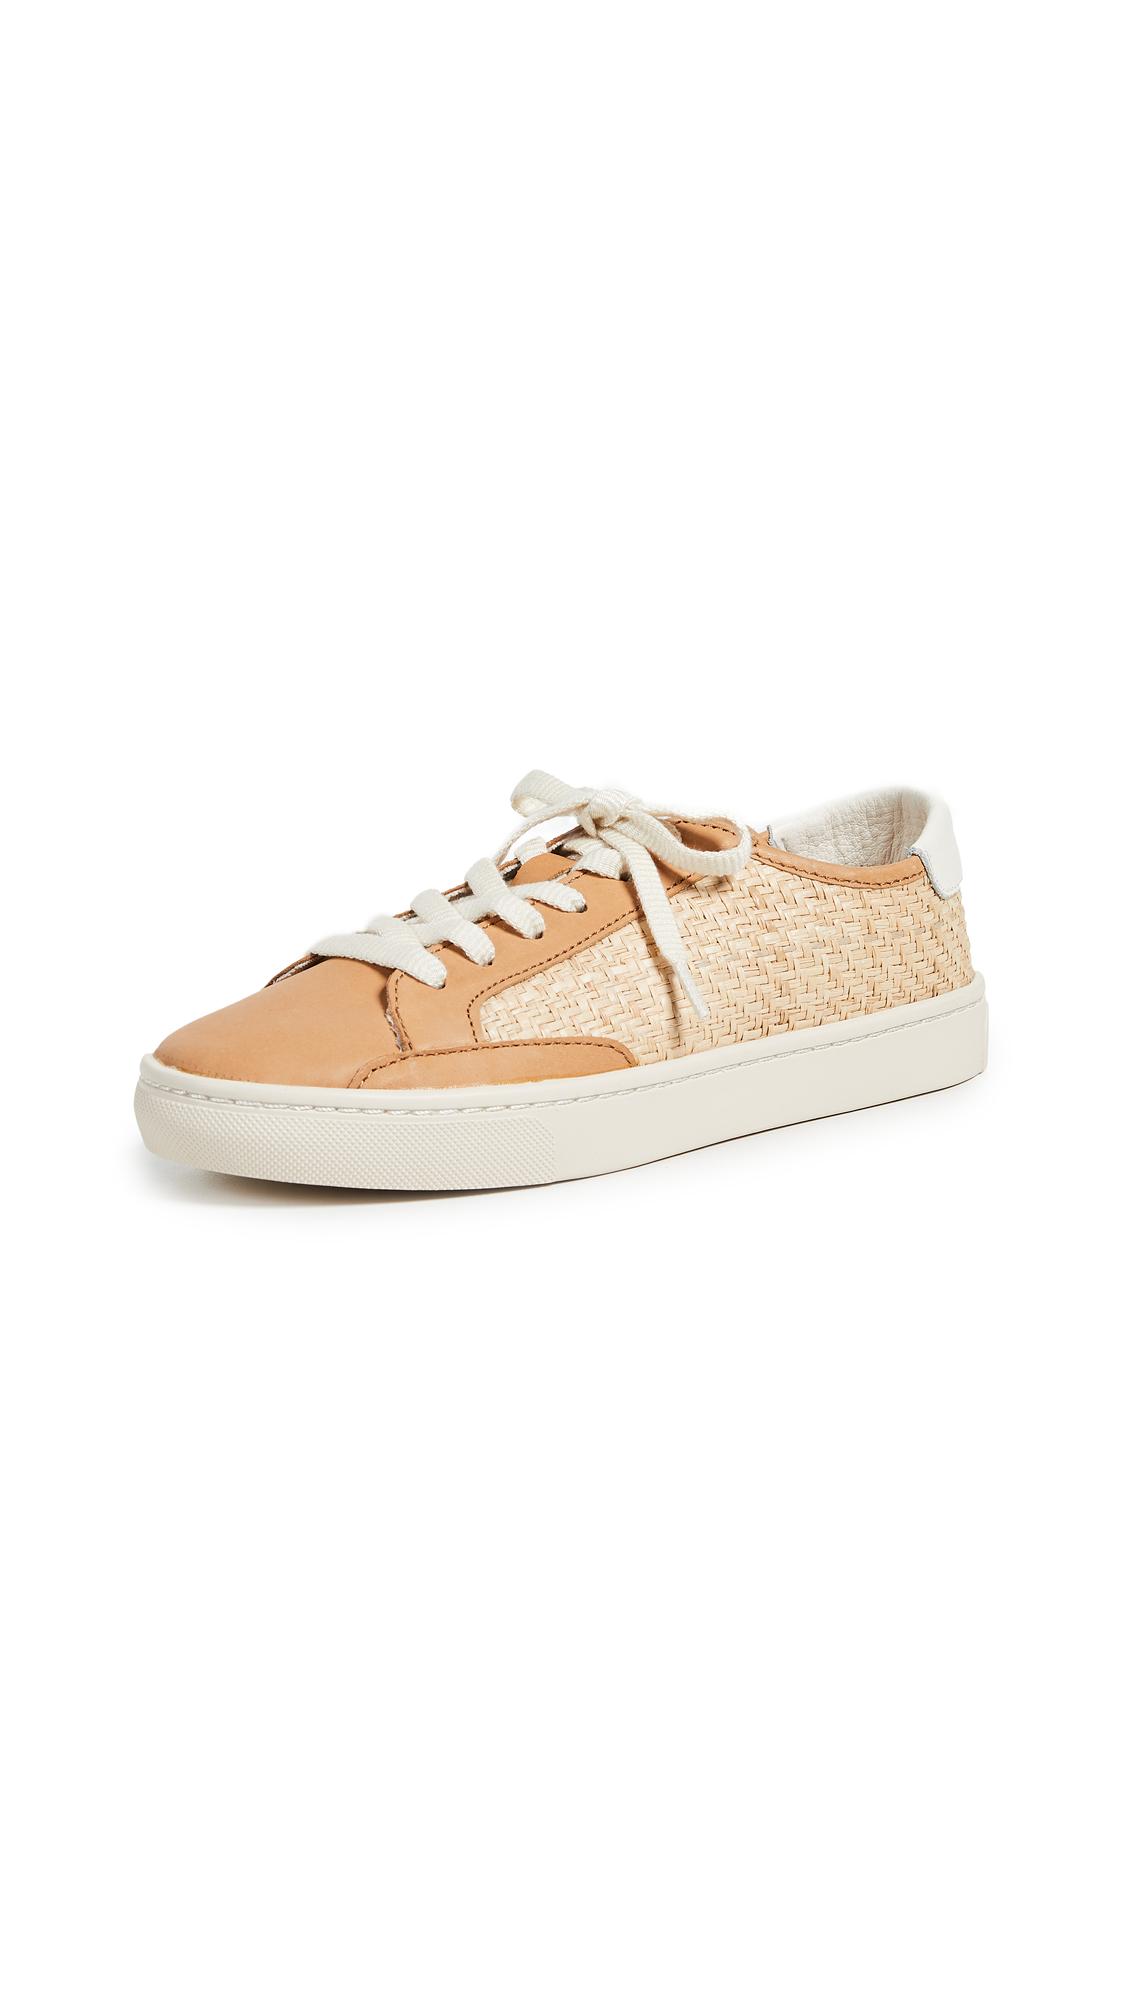 Soludos Ibiza Raffia Sneakers - Natural/Beige